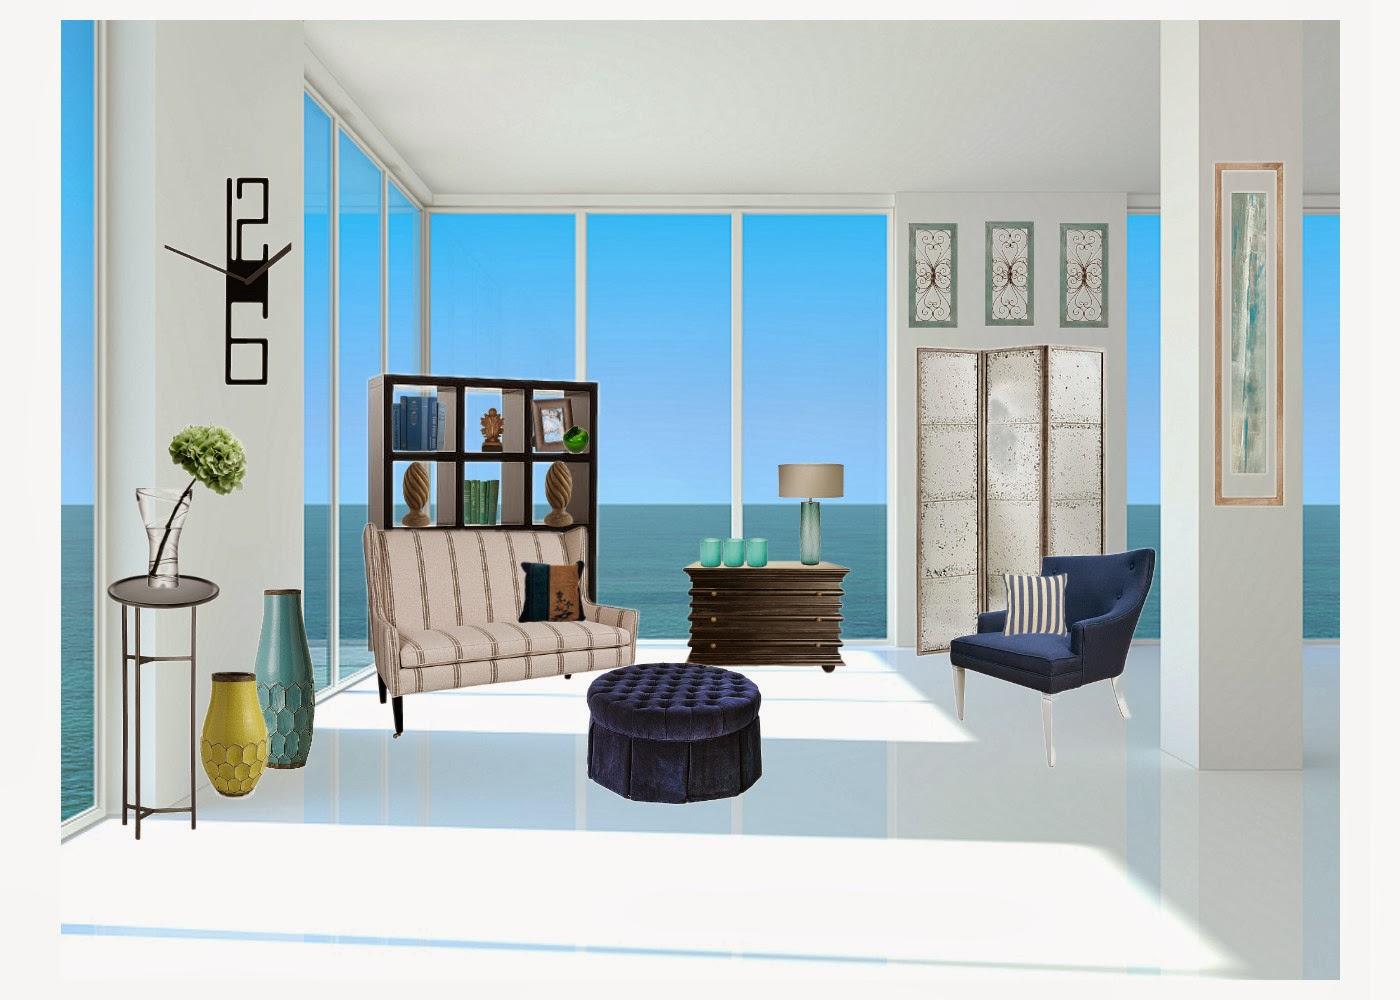 Vertical Line Design : Debbie pula interior design elements of line